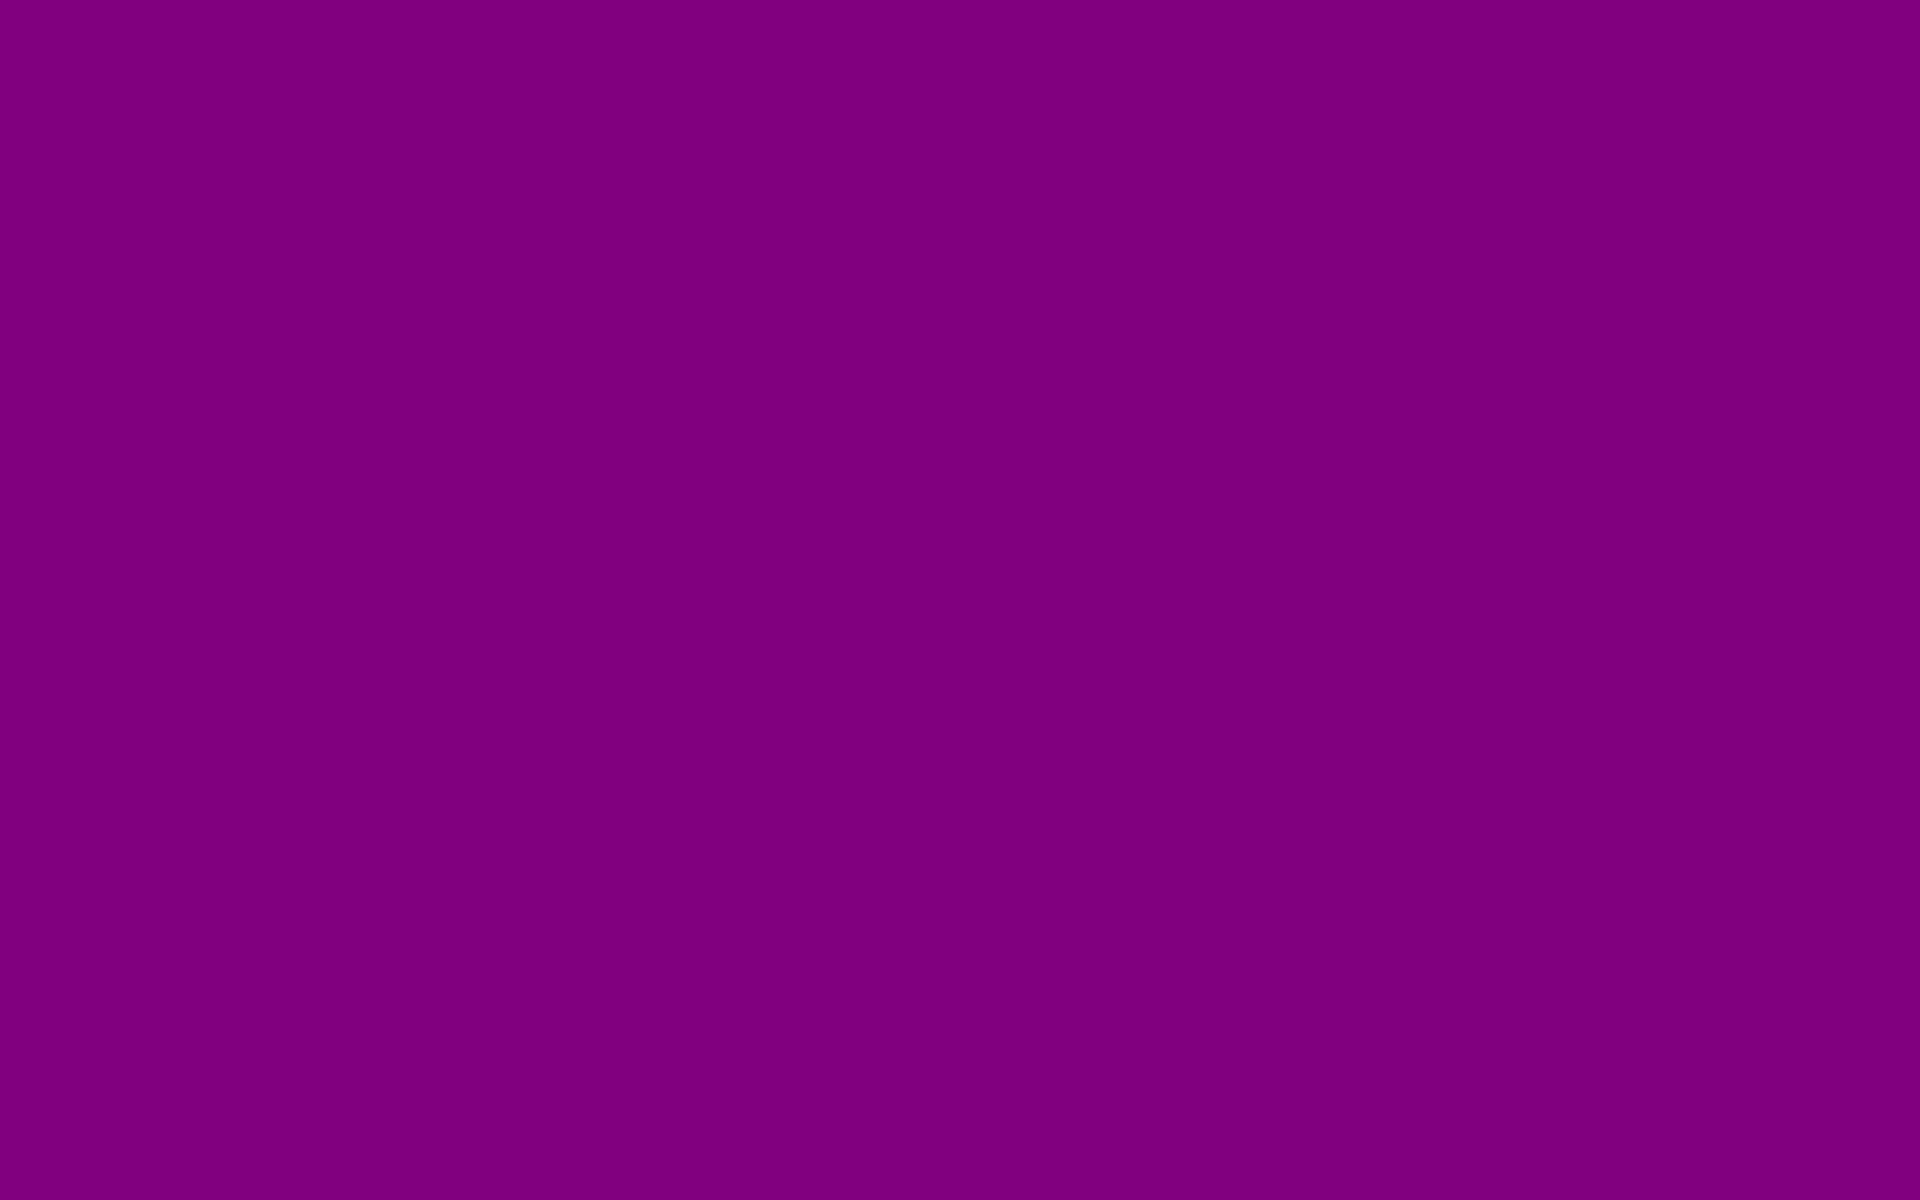 Resolution Purple Web 1920x1200